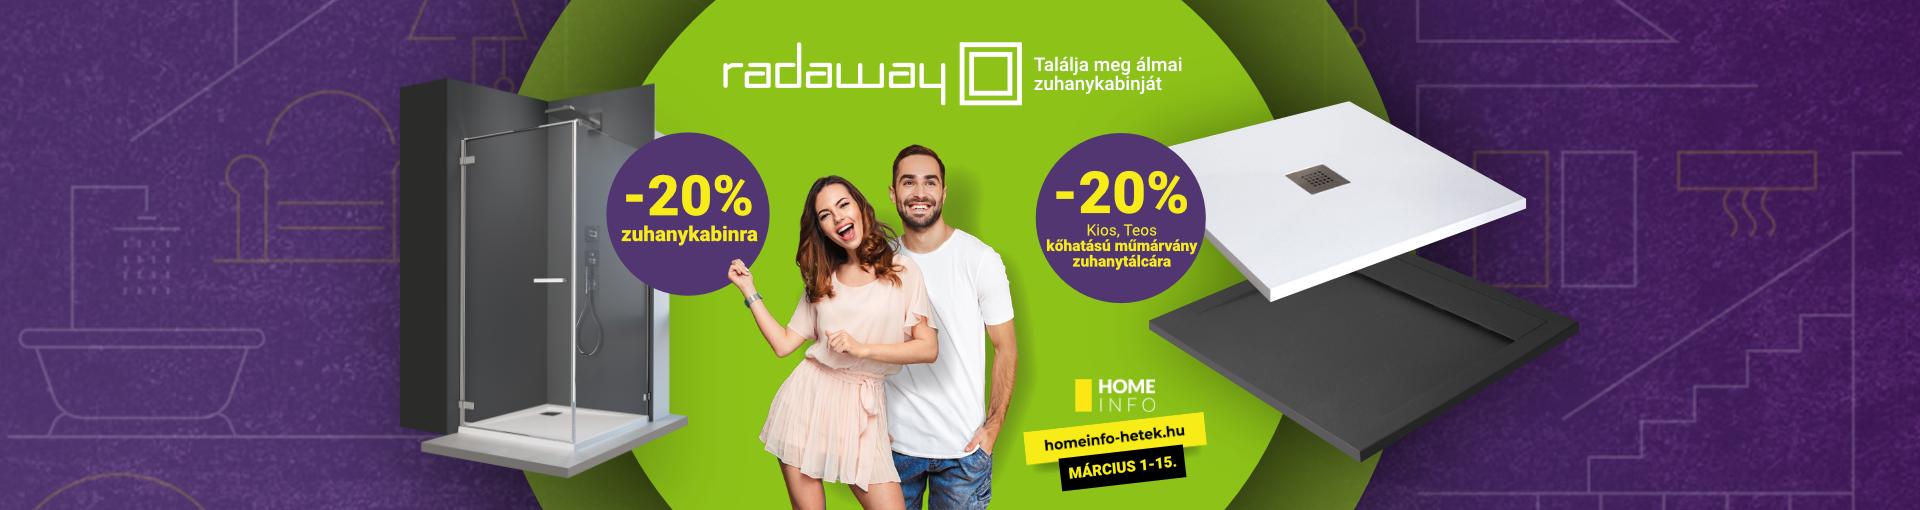 Homeinfo radaway